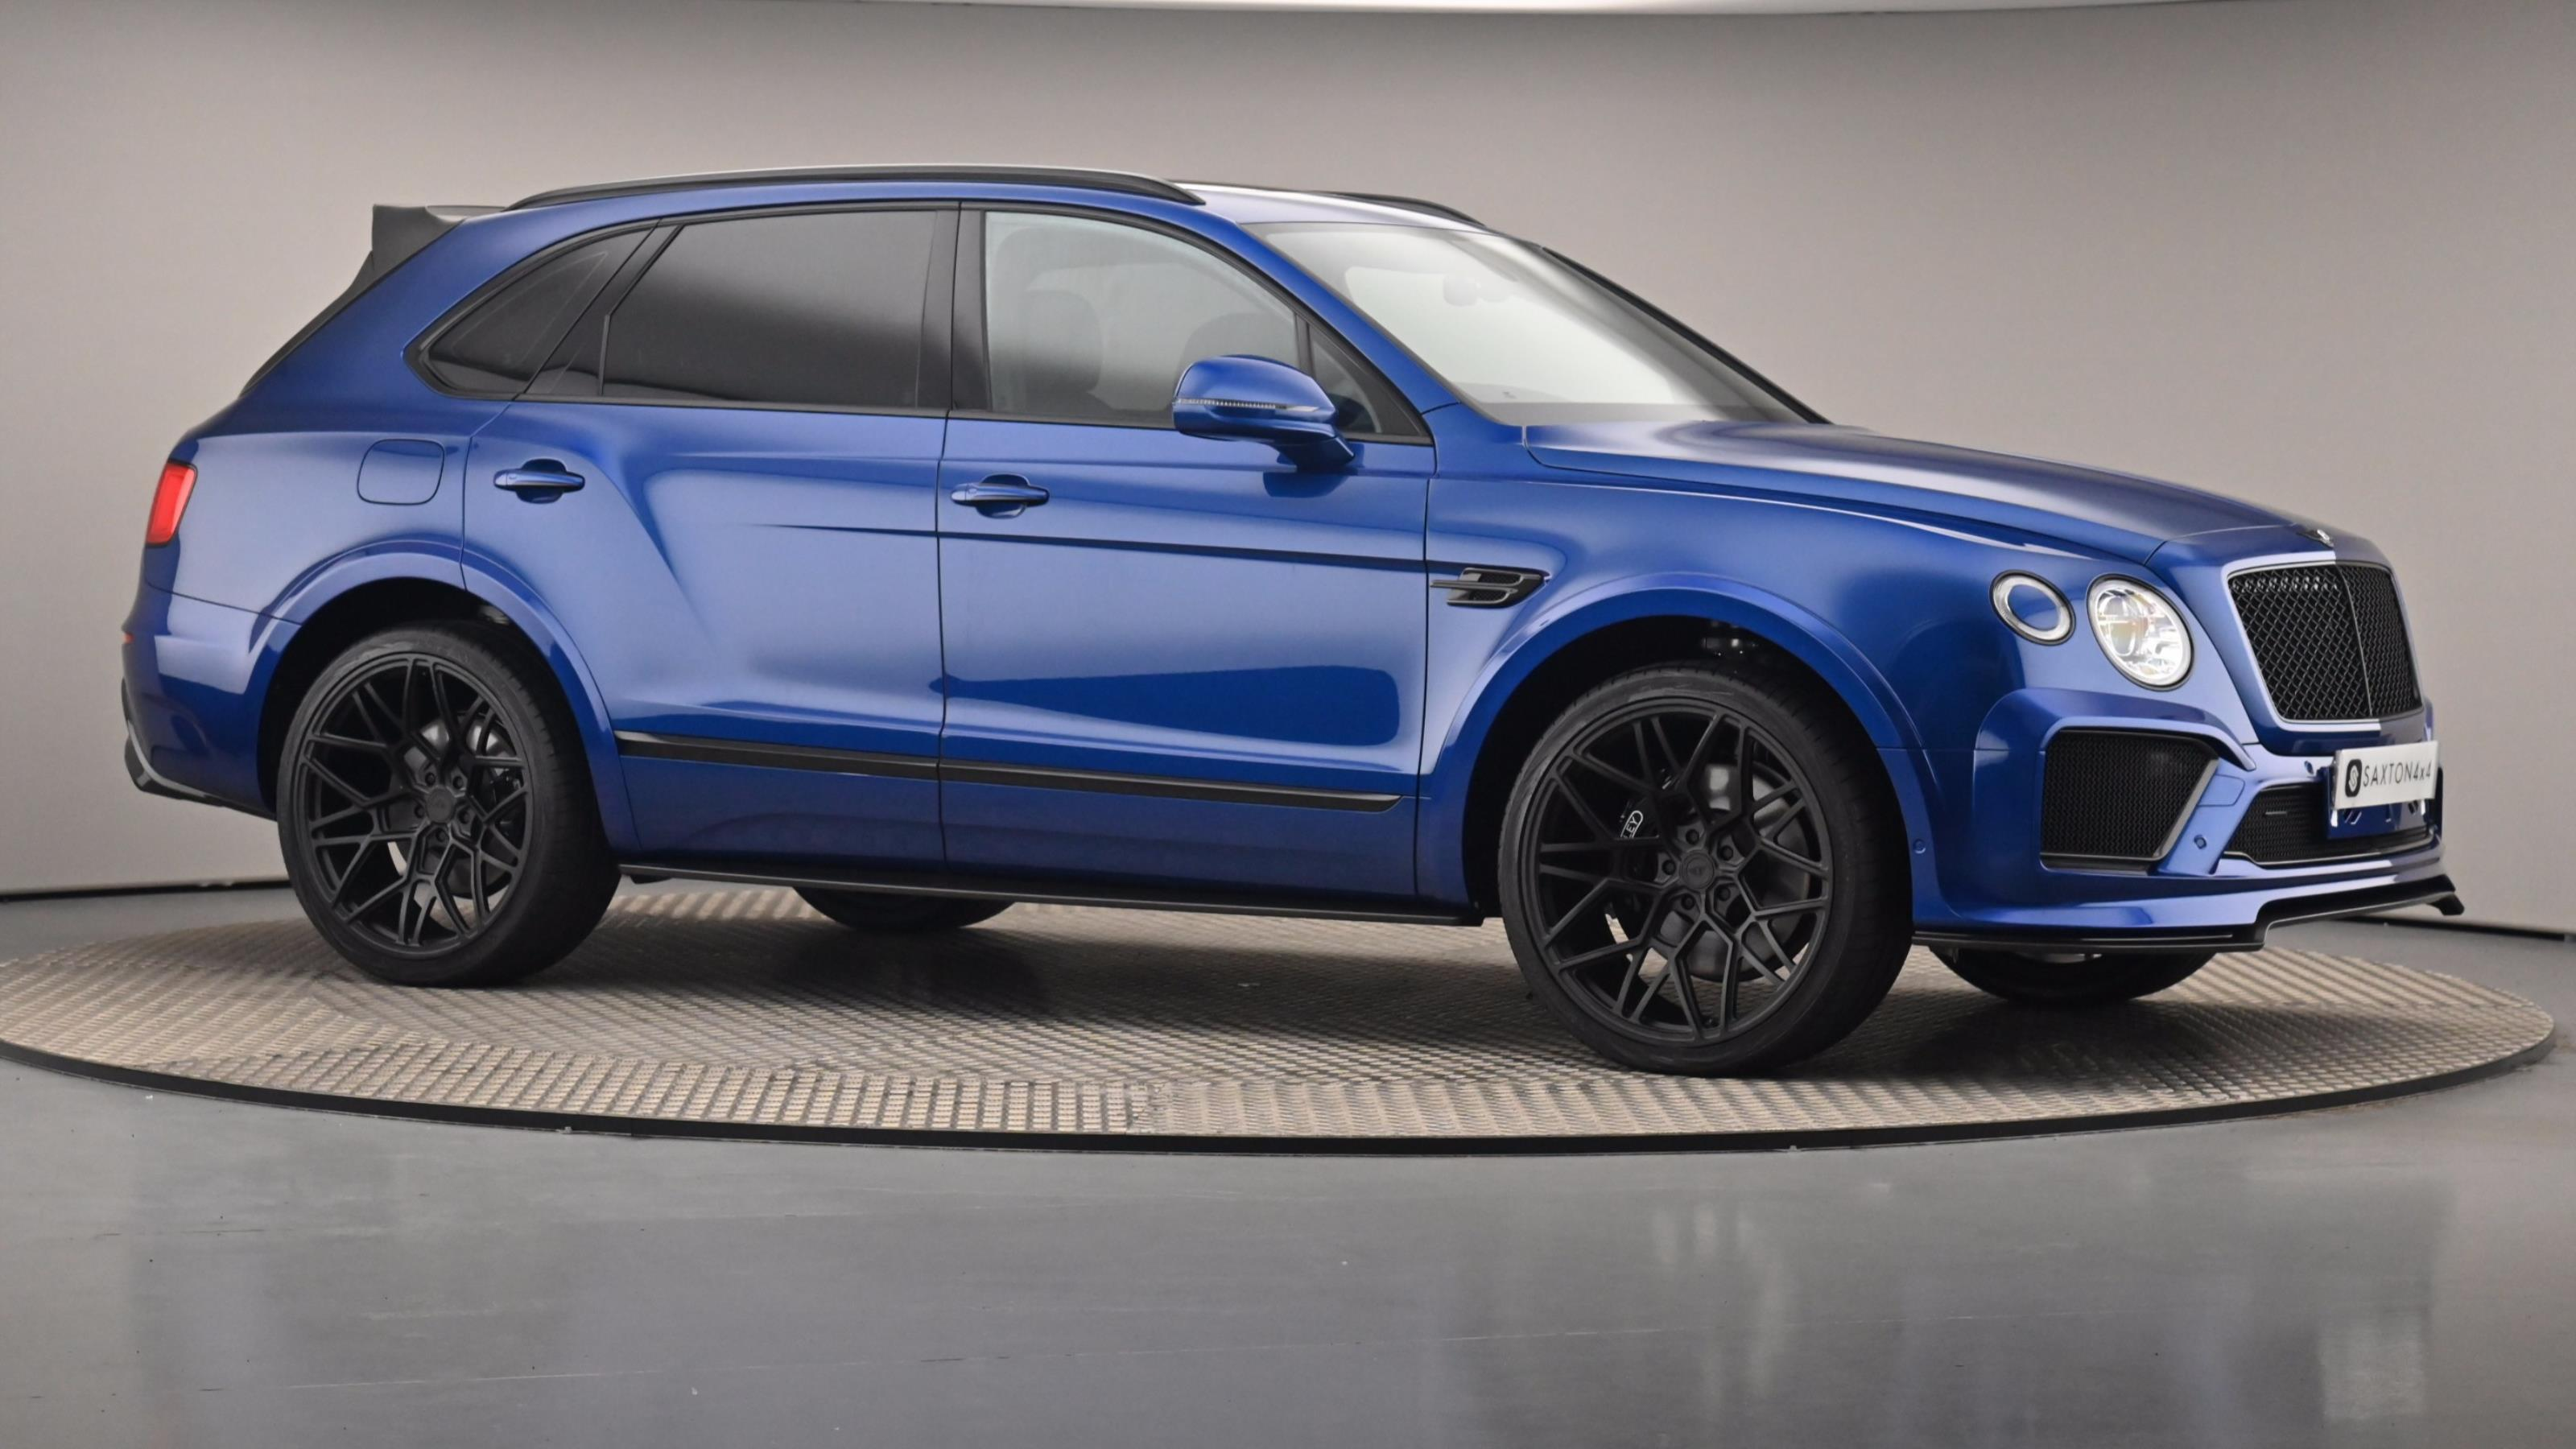 Used 19 Bentley BENTAYGA 4.0 V8 Mulliner Driving Spec 5dr Auto BLUE at Saxton4x4